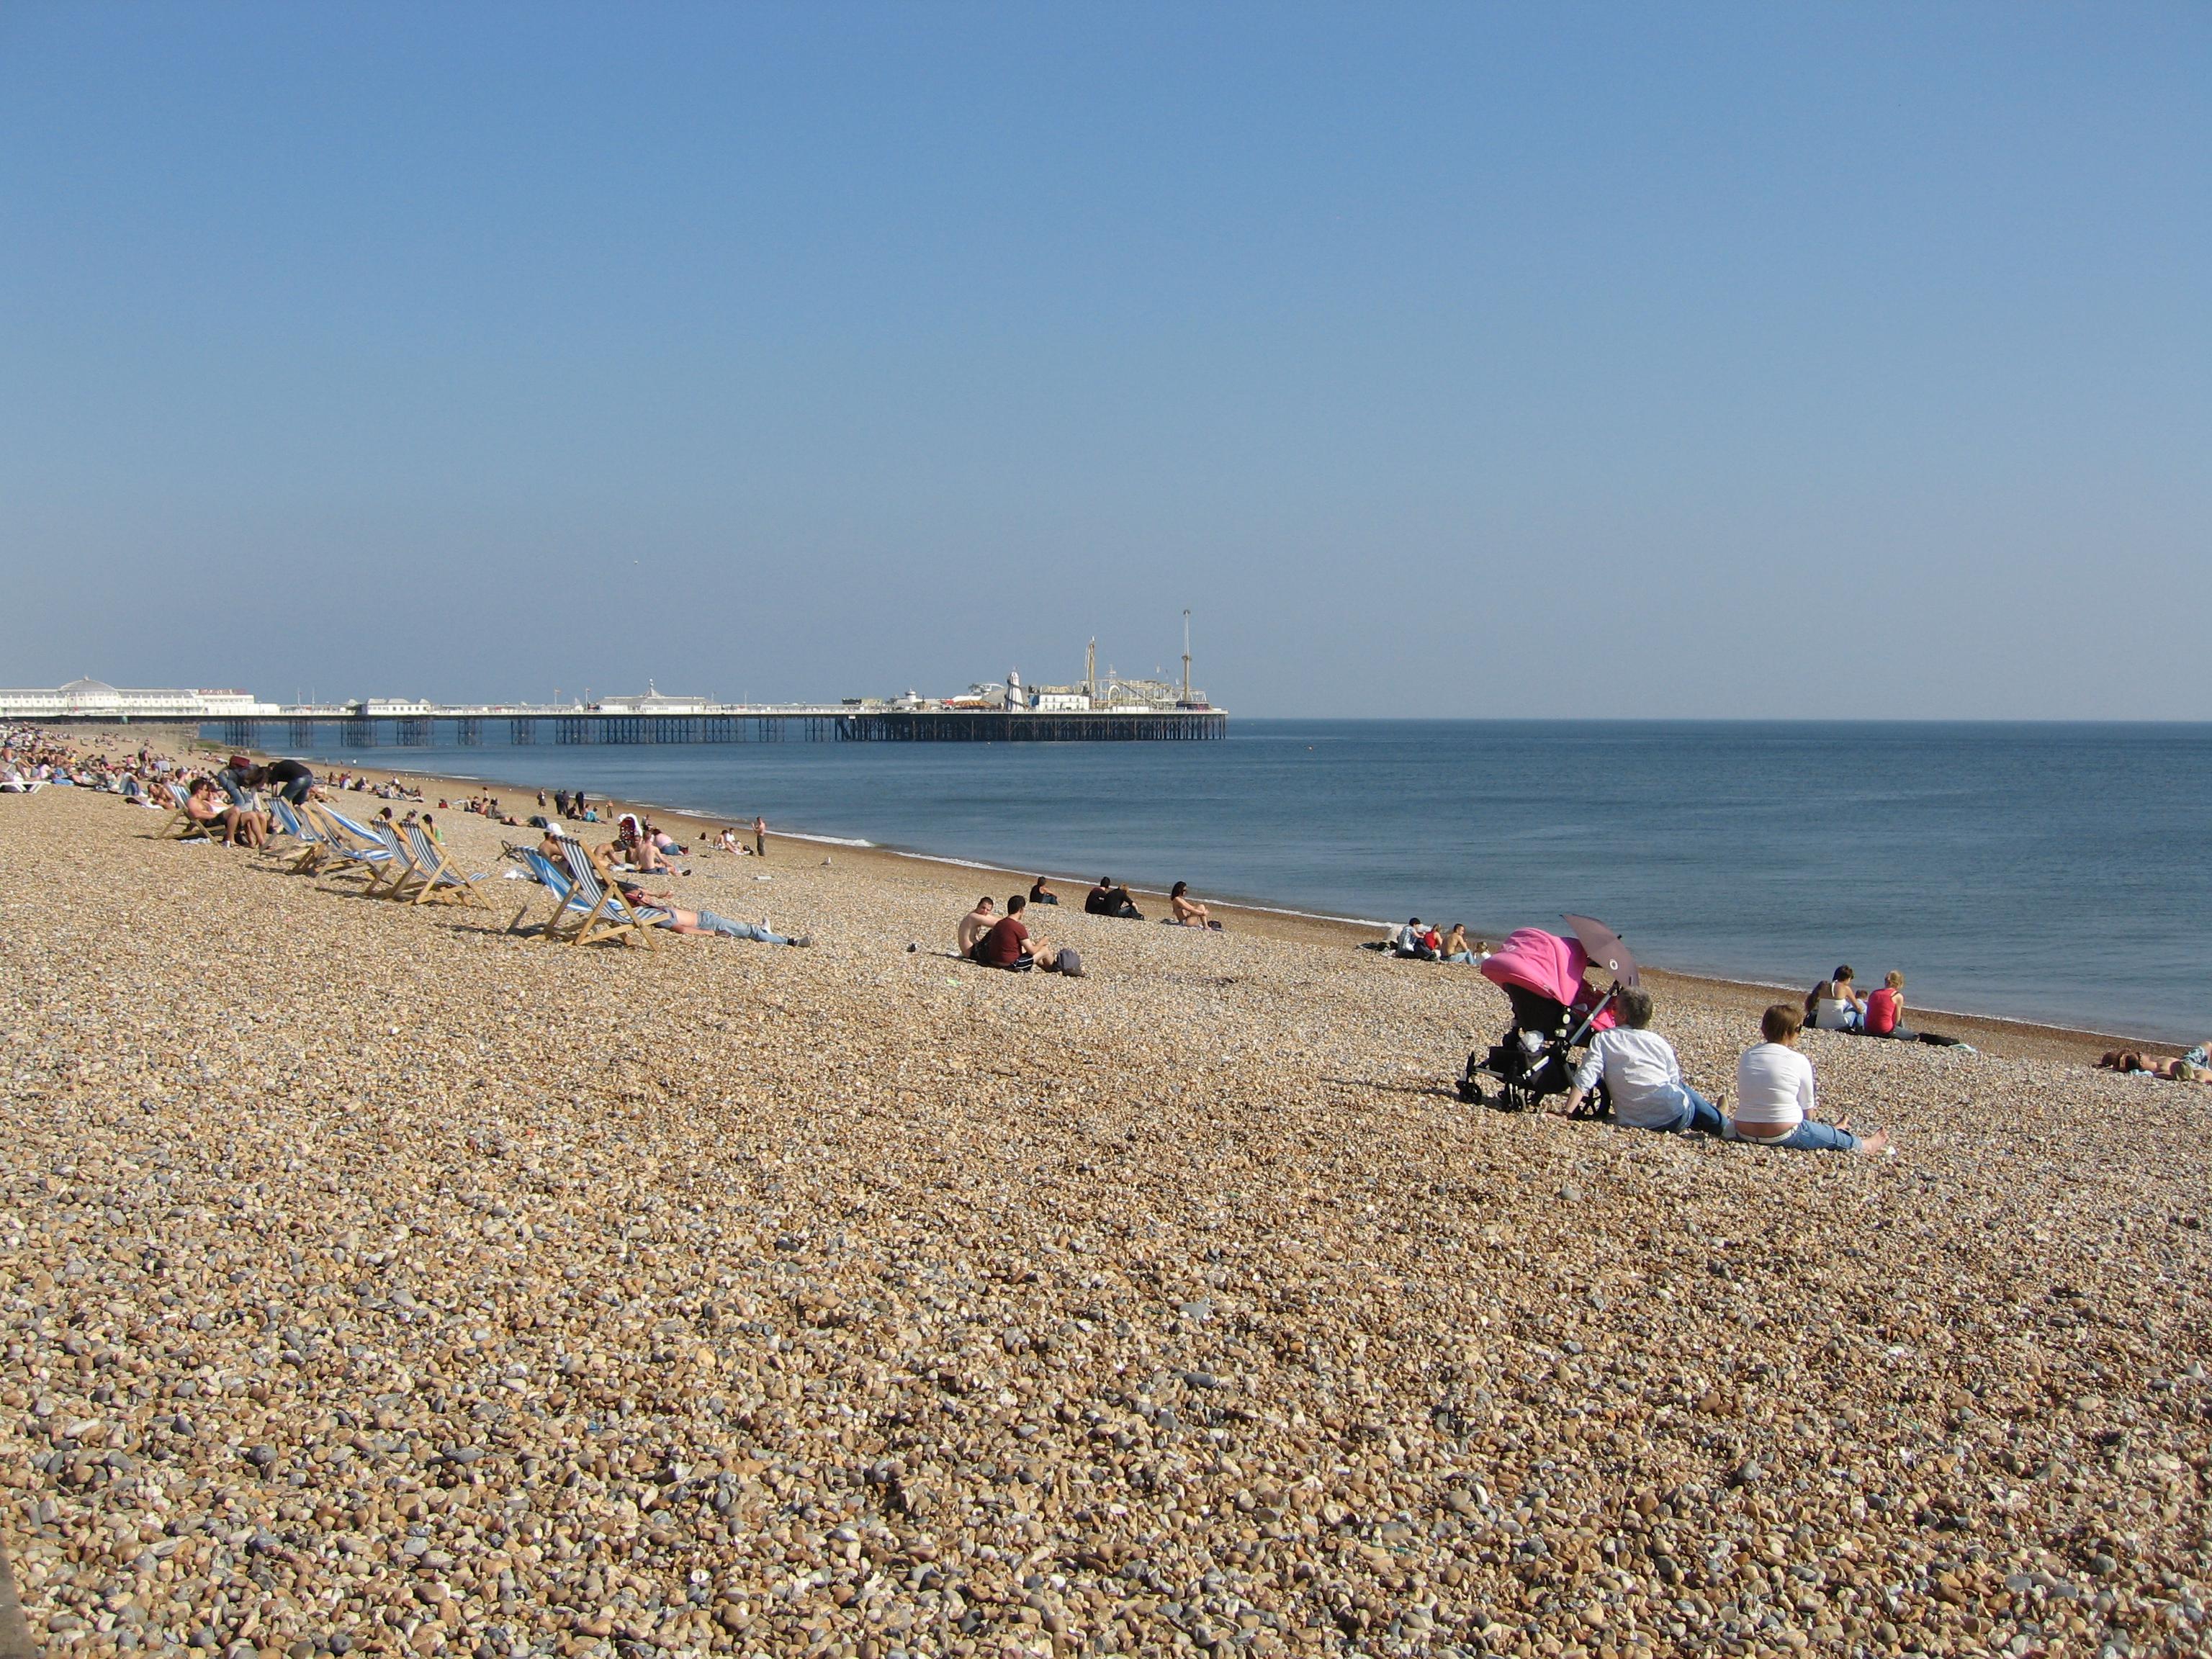 Pebble Beach Brighton Brighton Beach | Flickr